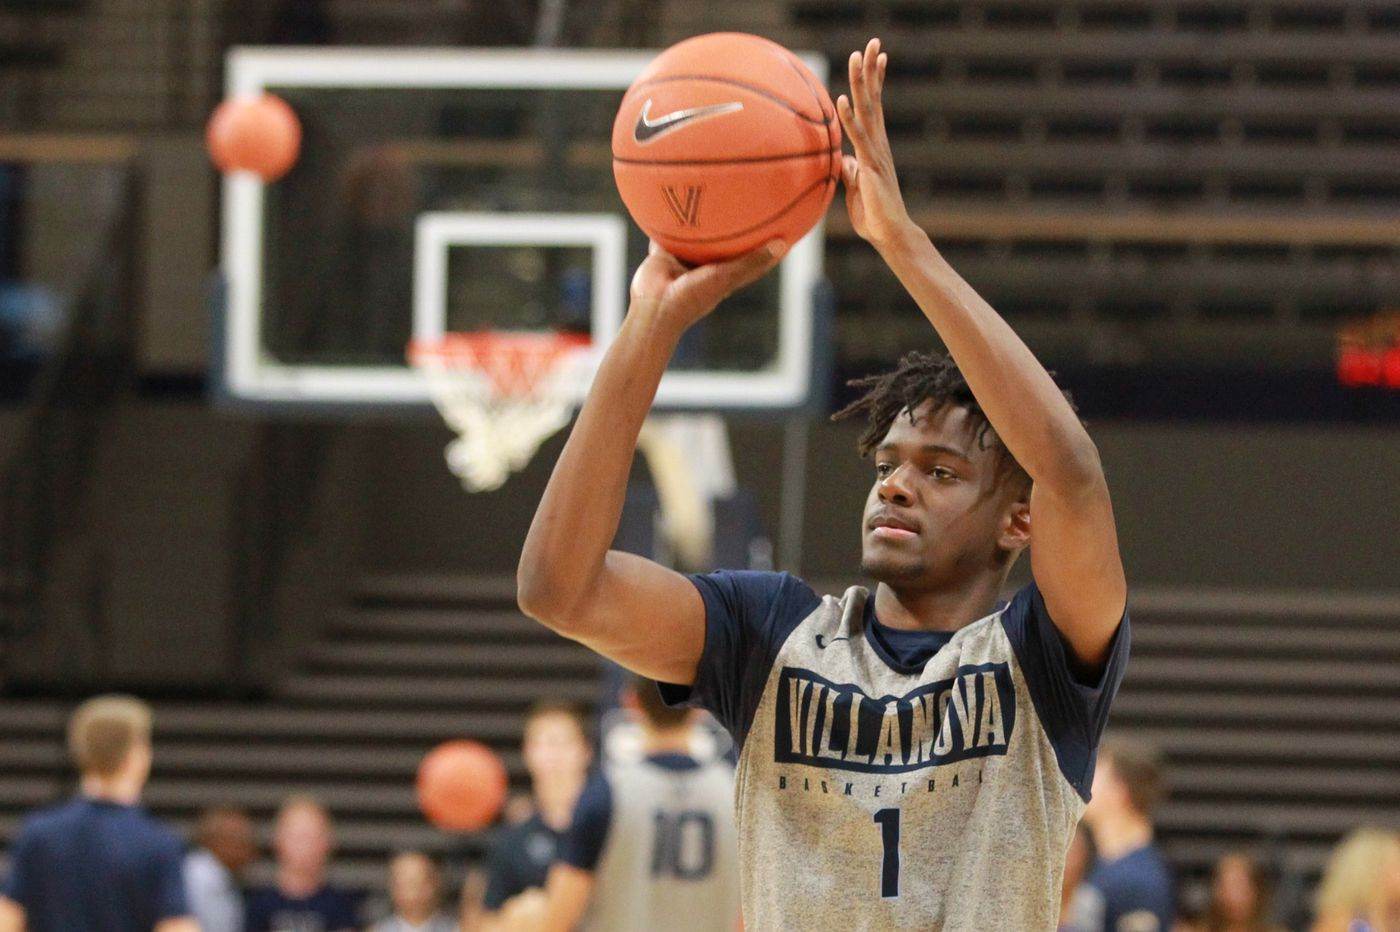 Bryan Antoine, highly regarded freshman guard, cleared to begin practice at Villanova